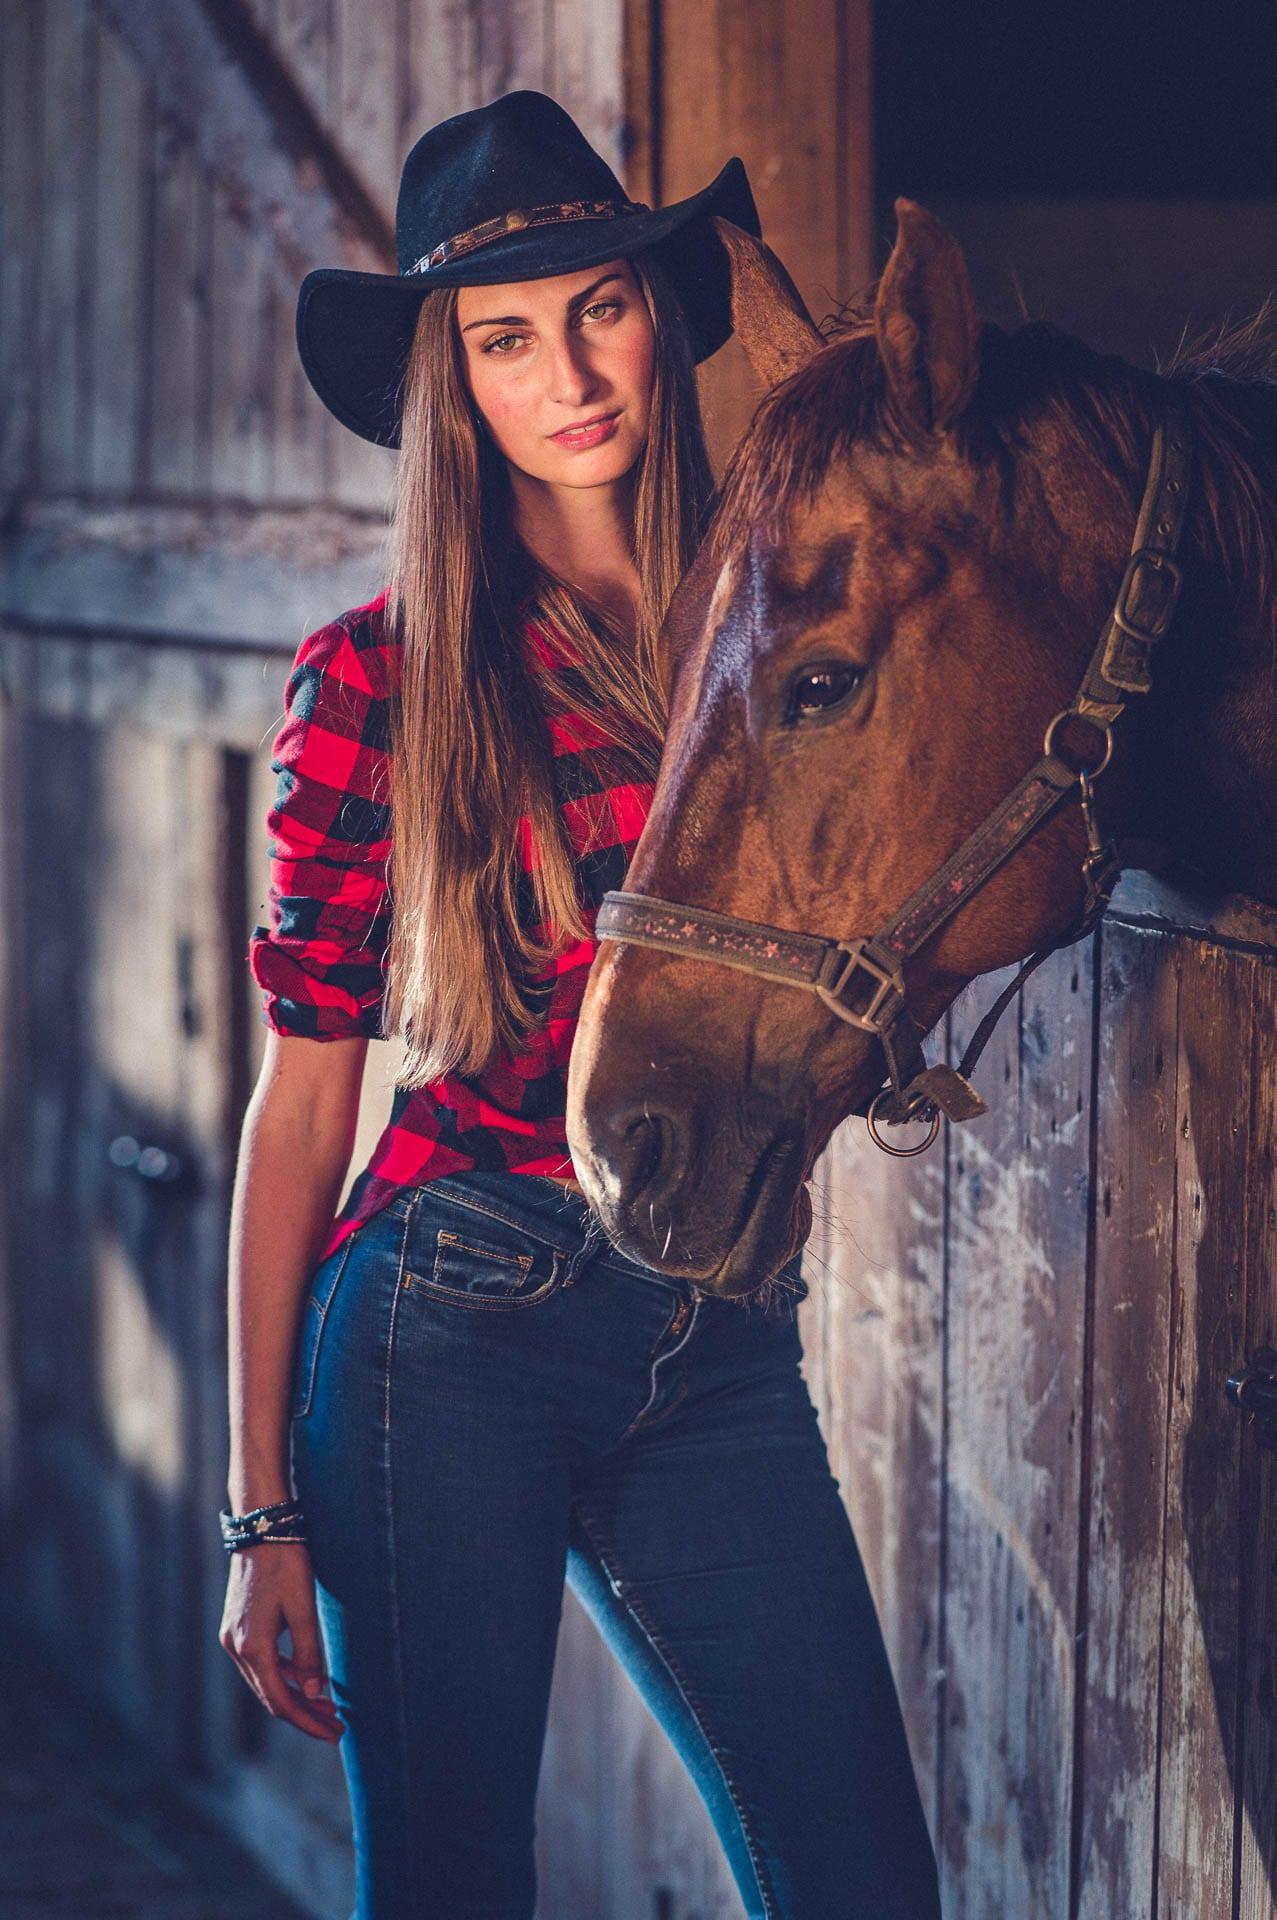 AF_Ranch_Pferdefotografie_200606_GZ6_6769